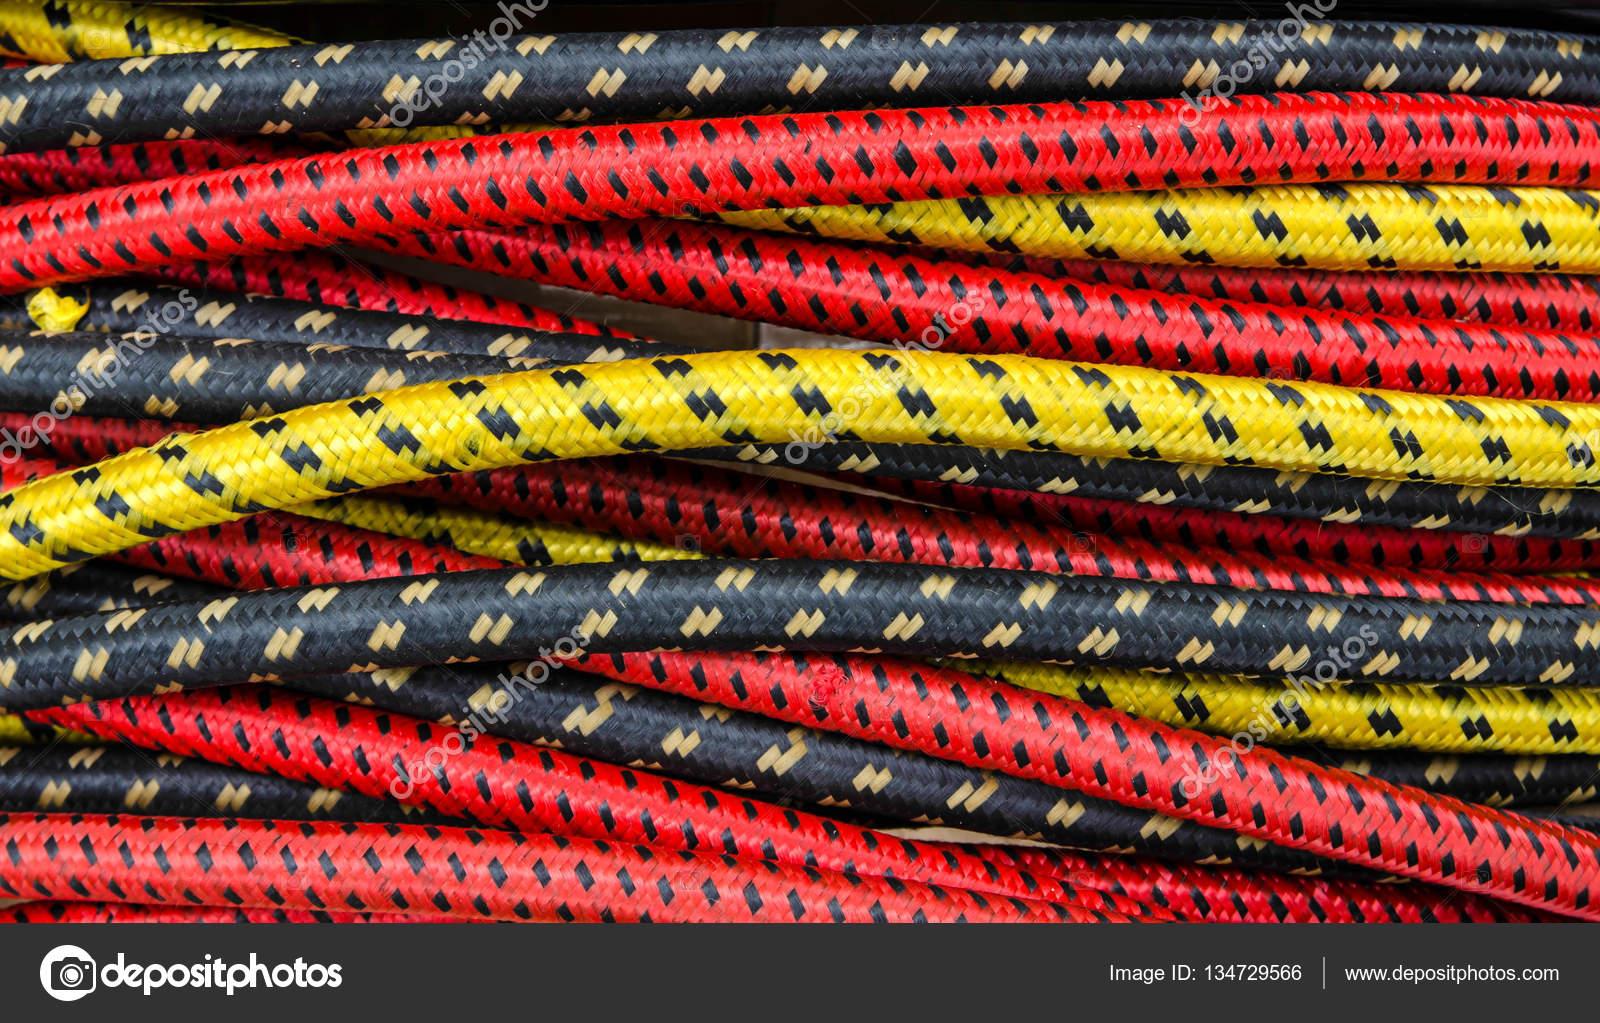 Röd slang blåsa